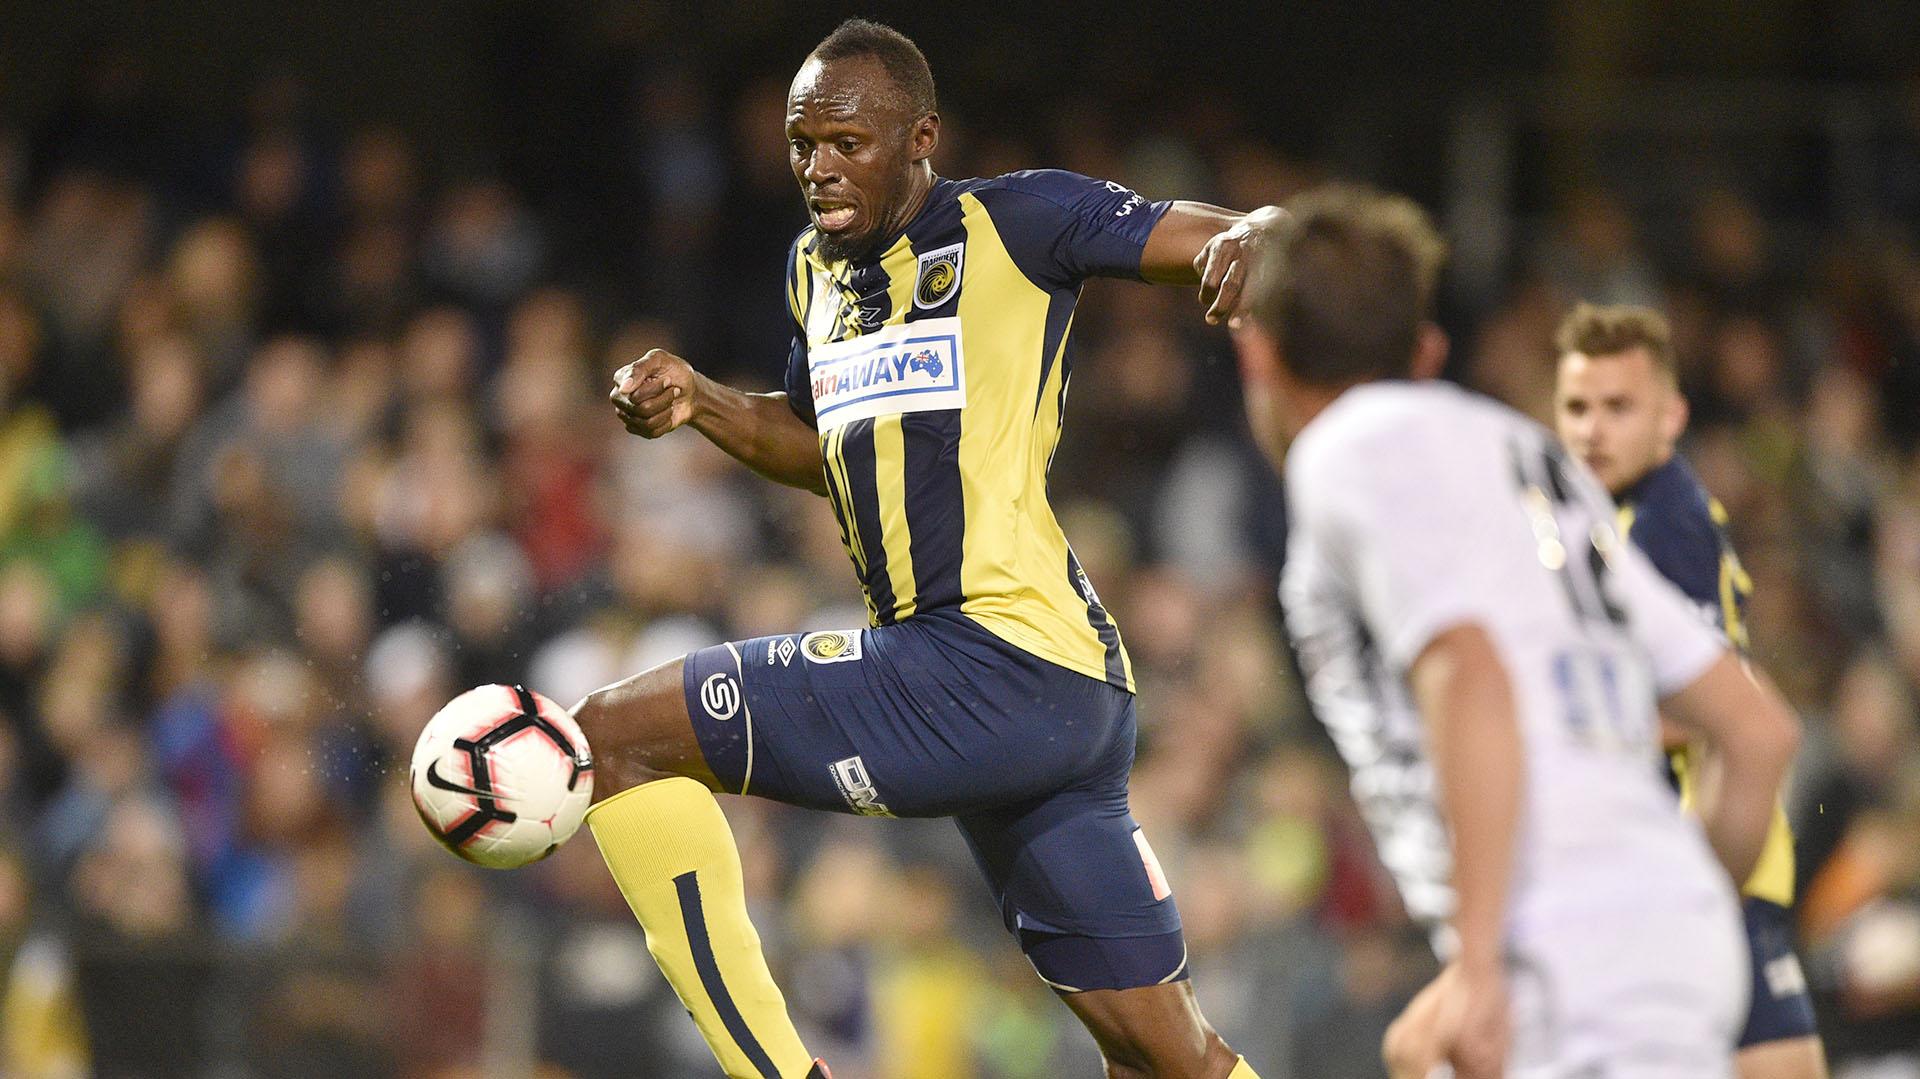 (AFP) Bolt convirtió dos goles en su último partido